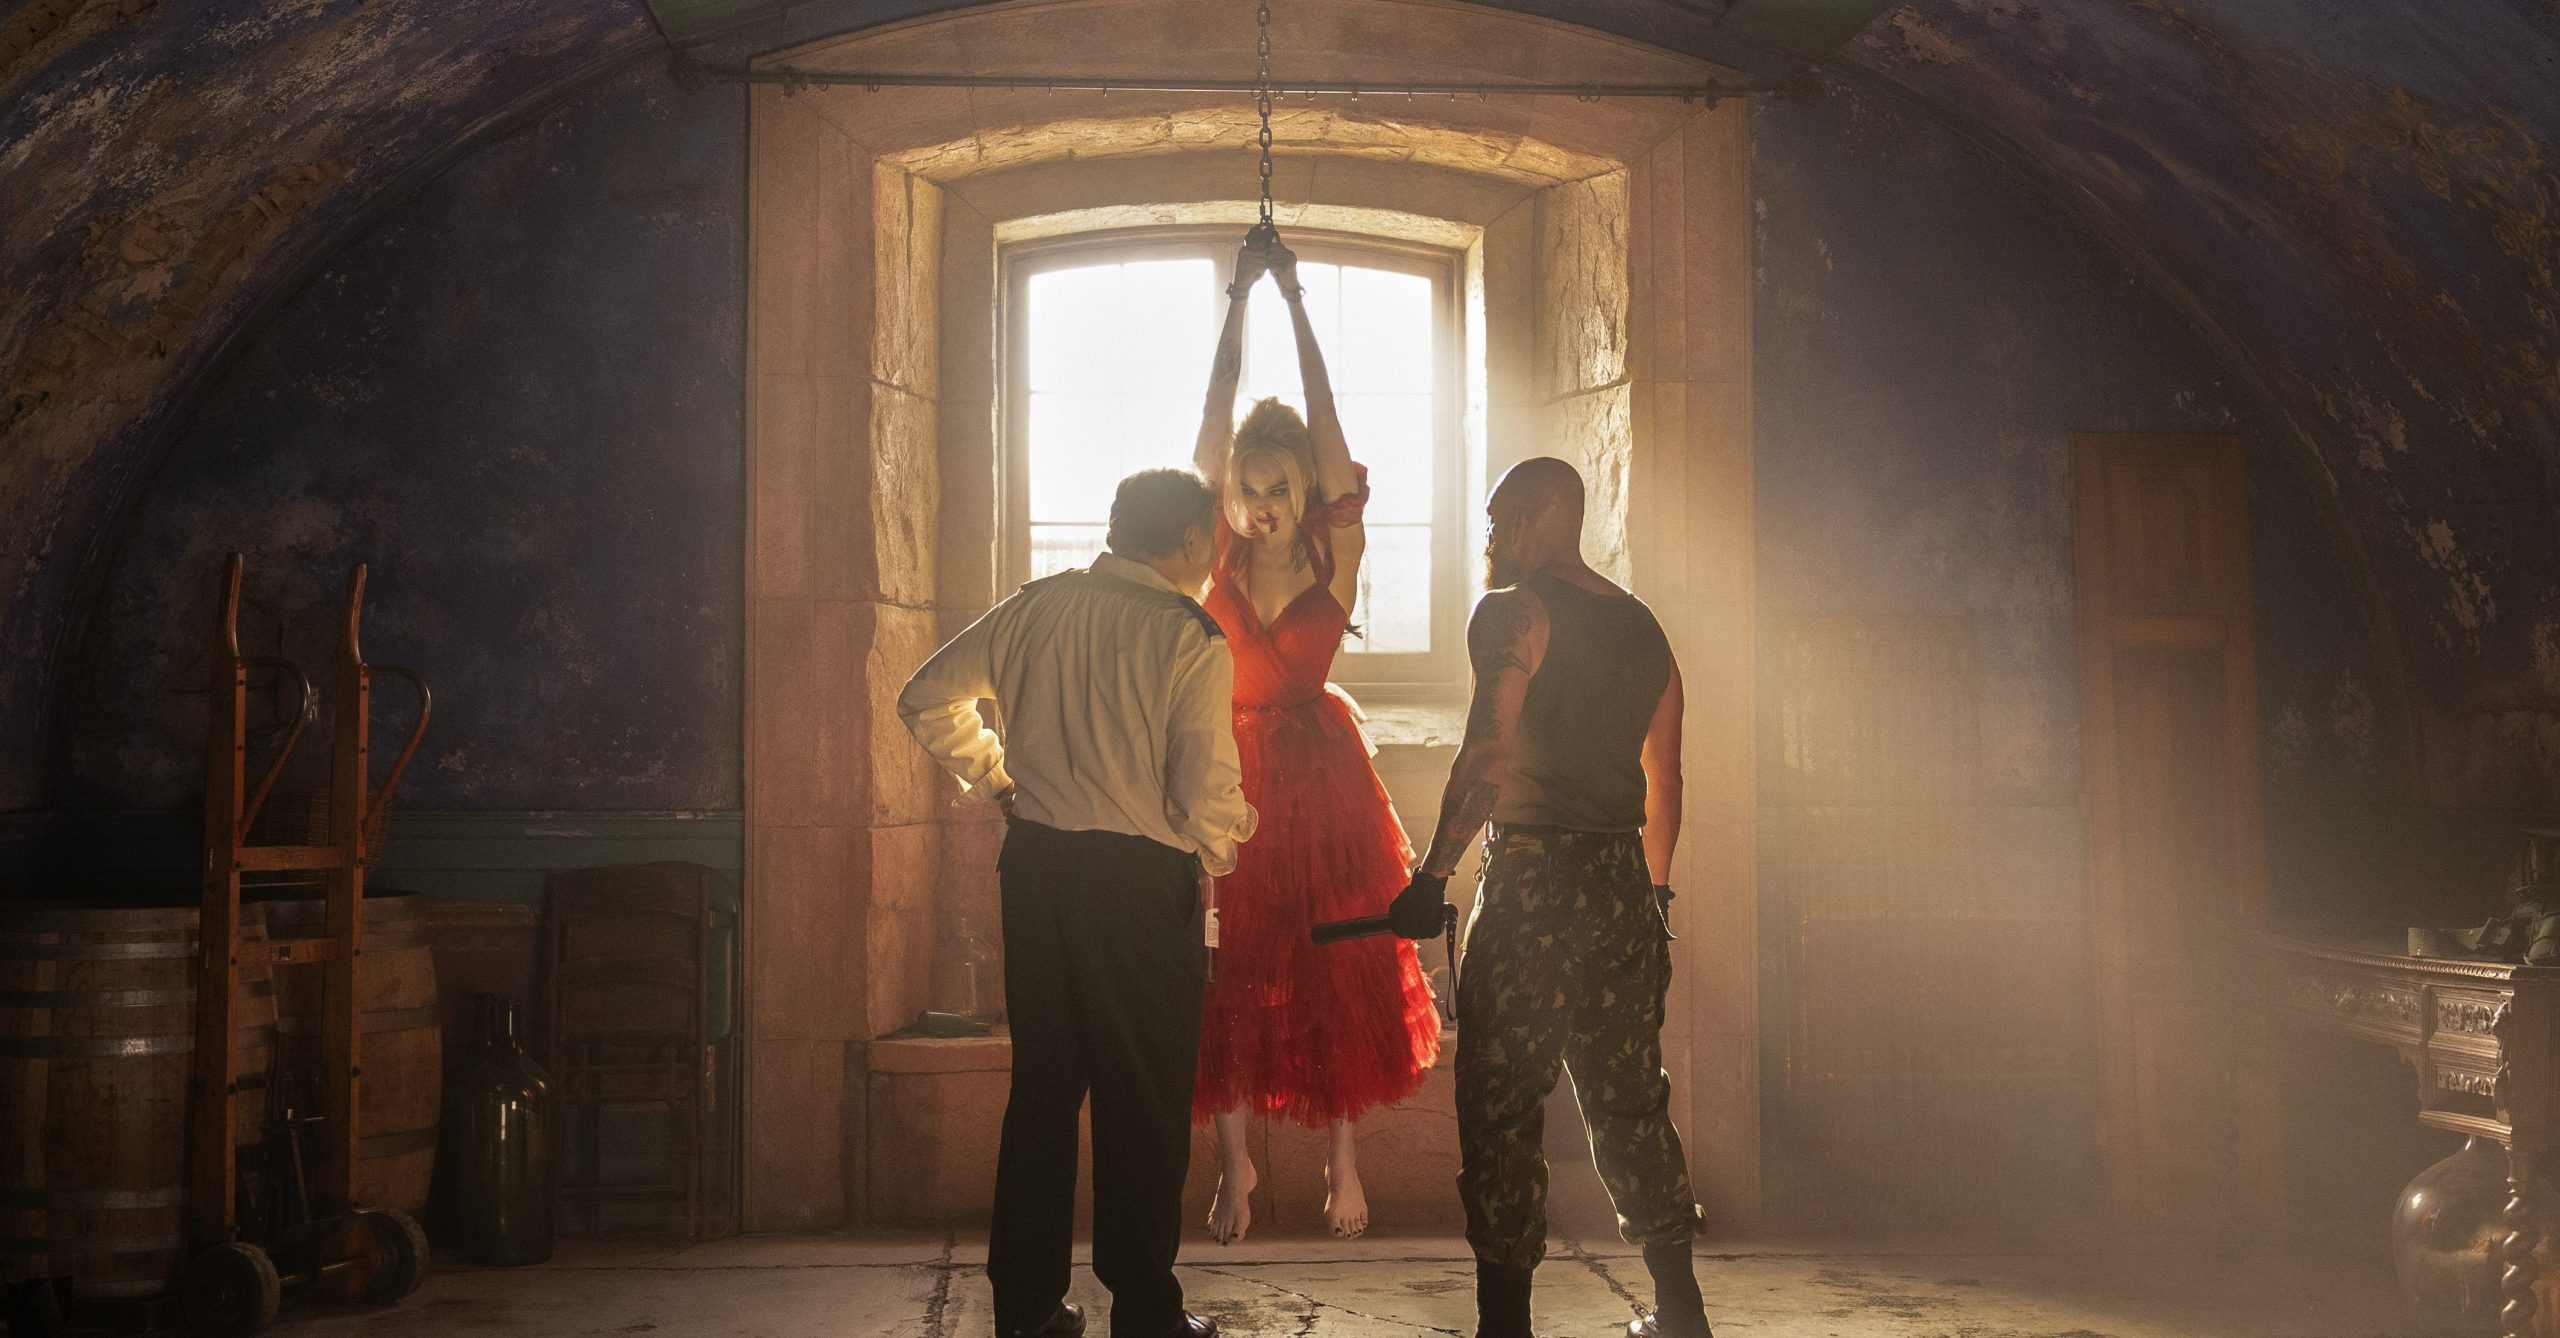 'Suicide Squad' tops box office in North America